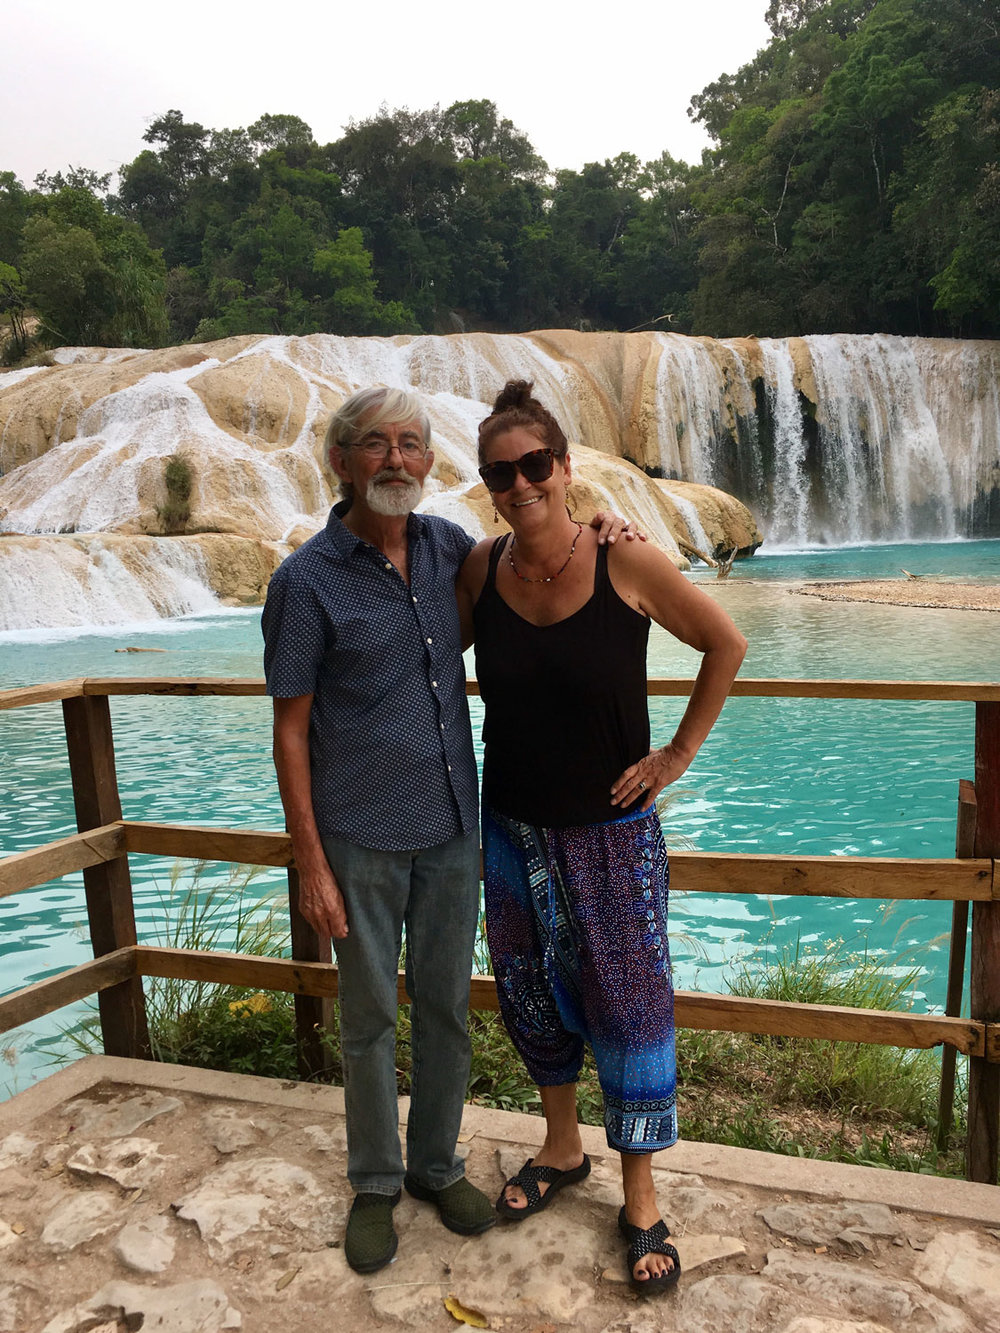 Hammocks_and_Ruins_Town_Villages_Chiapas_Lakes_Rivers_Jungles_Highlands_Agua_Azul_Waterfalls39.jpg